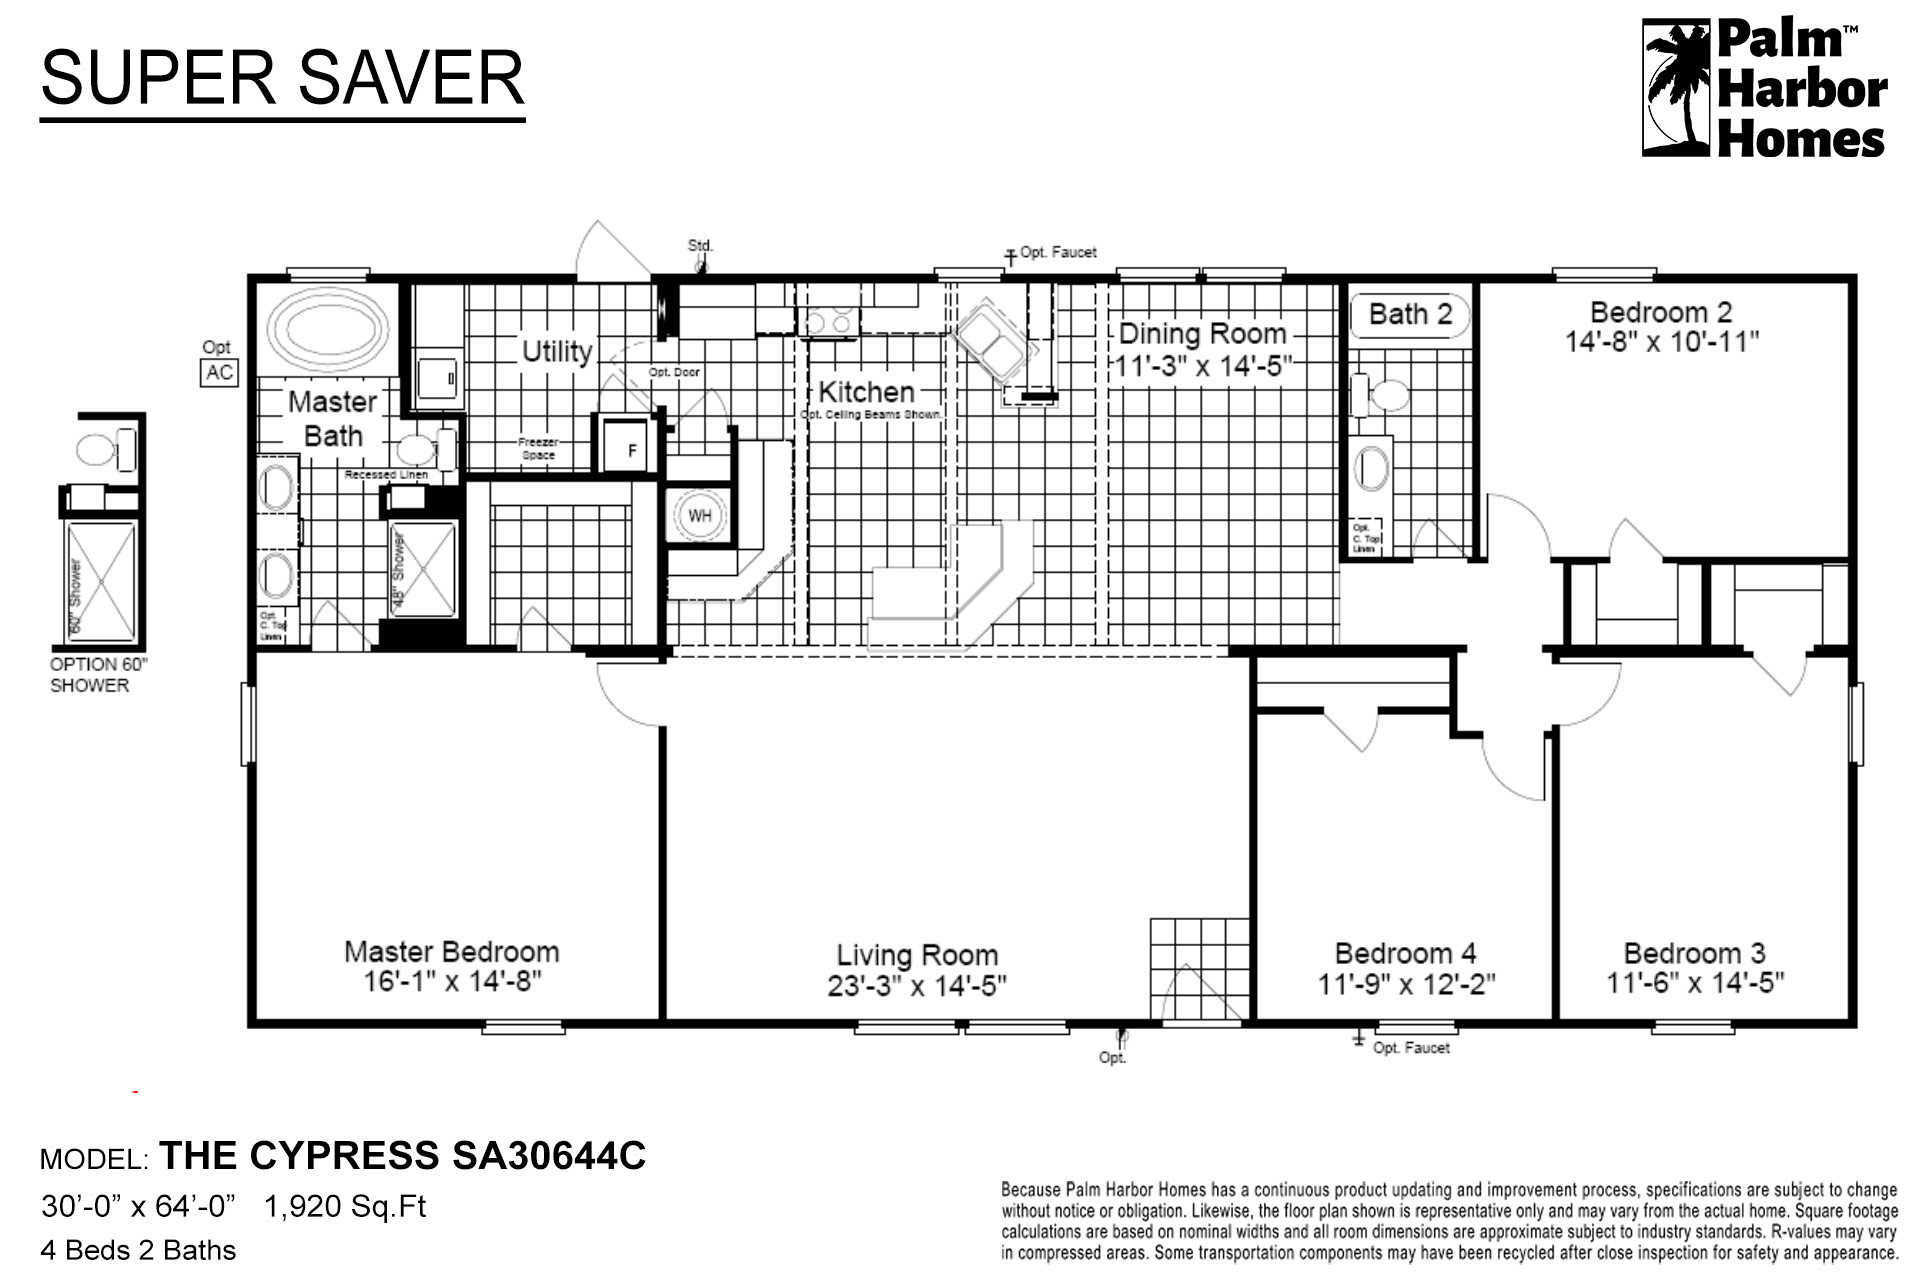 Super Saver - The Cypress SA30644C